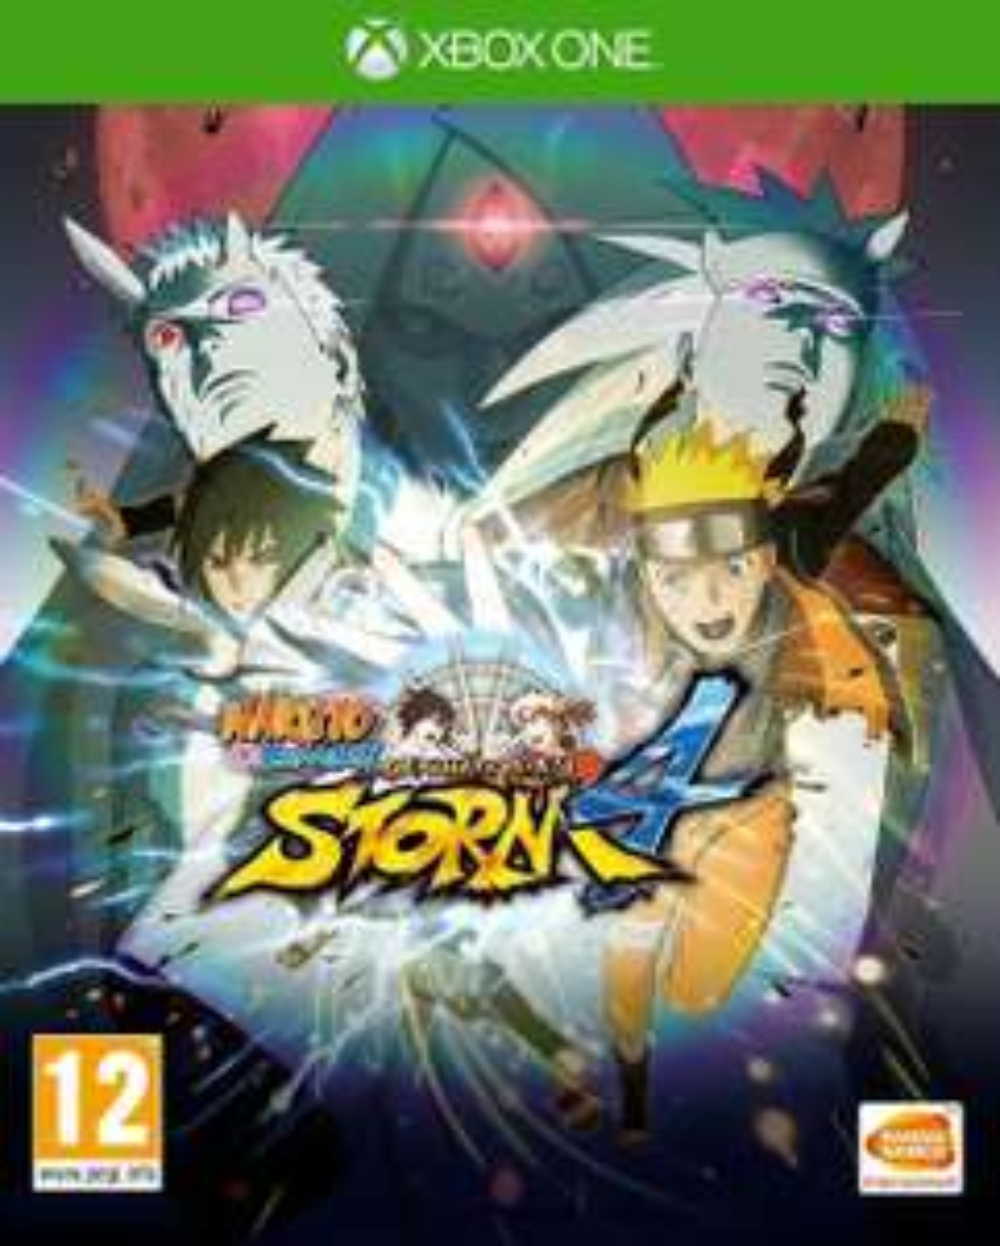 Jeu Naruto Shippuden : Ultimate Ninja Storm 4 sur Xbox One et PS4